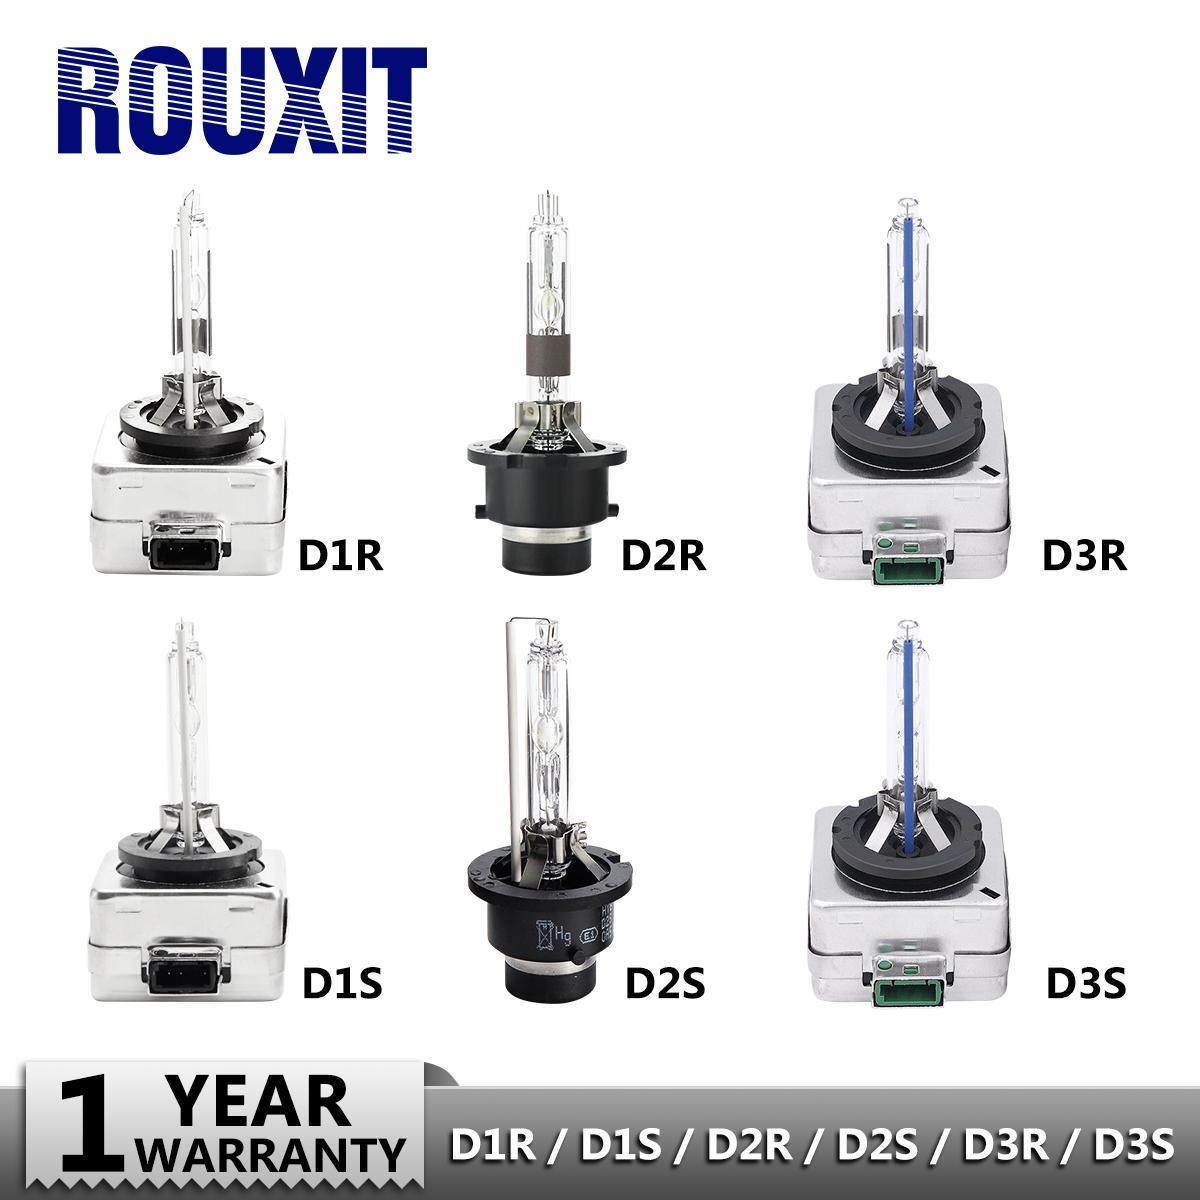 Pair HID Bulb D1S D1R D1C D2S D2C D2R D3S D3R D4S D4R Xenon HID Lamp Globe Lights 35W 3000K 4300K 5000K 6000K 8000K 10000K 12000K